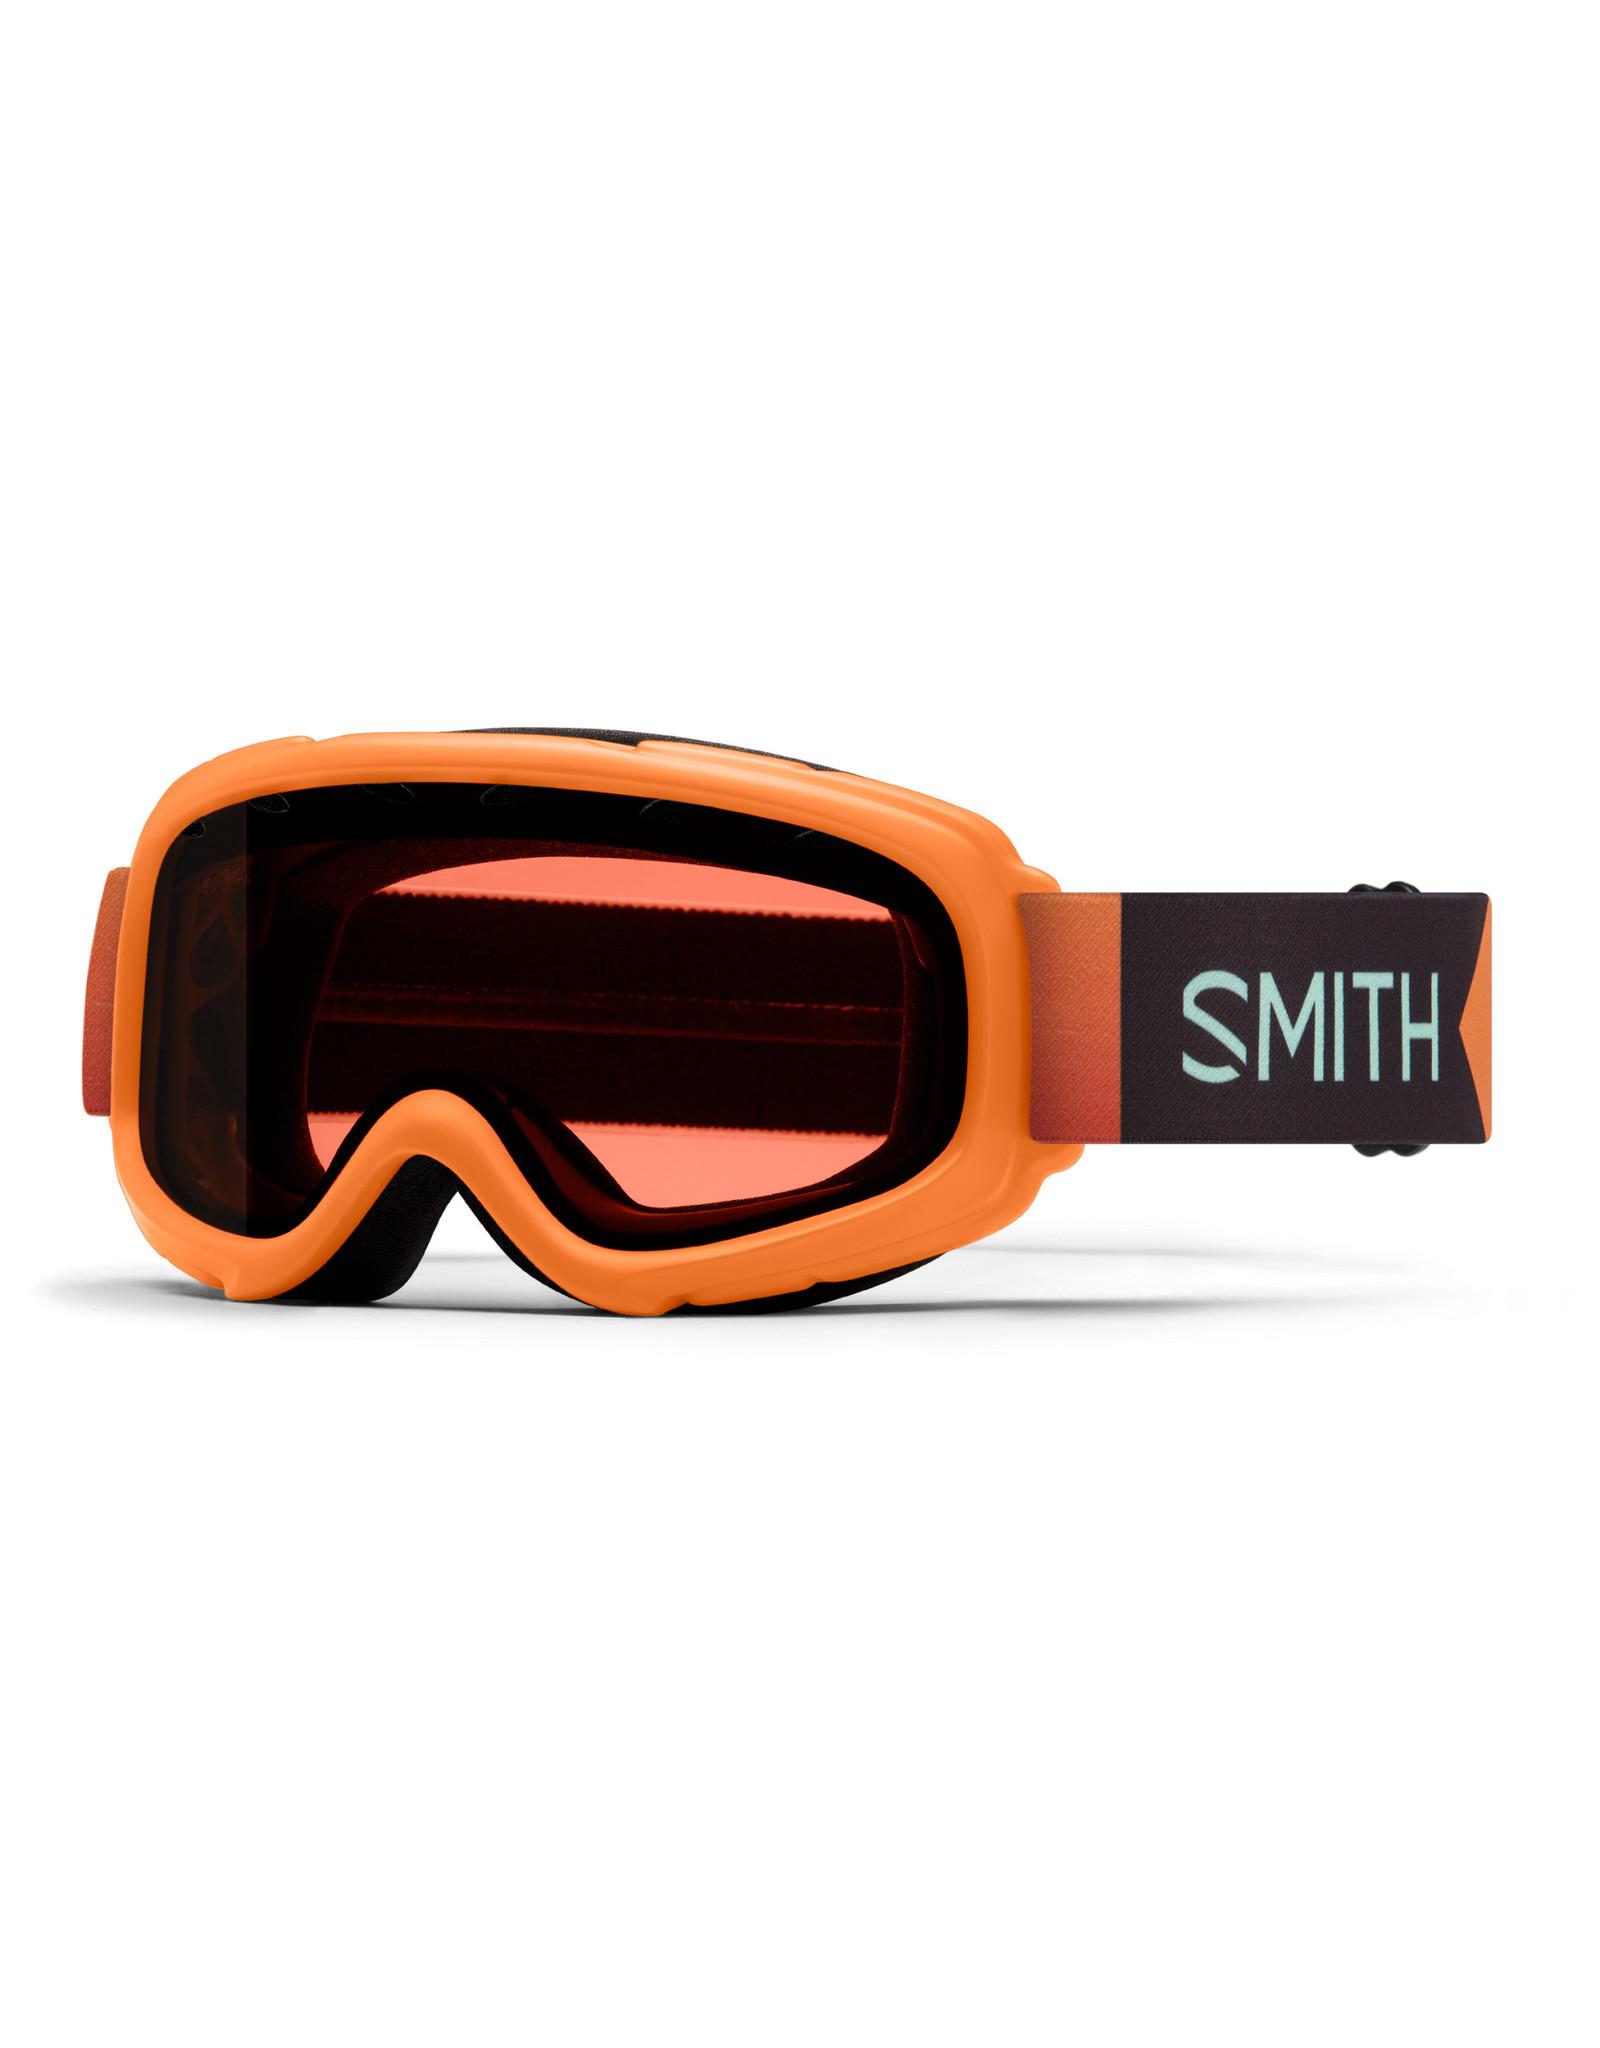 Smith SMITH DAREDEVIL HABANERO EGO 20 SKI GOGGLE YOUTH